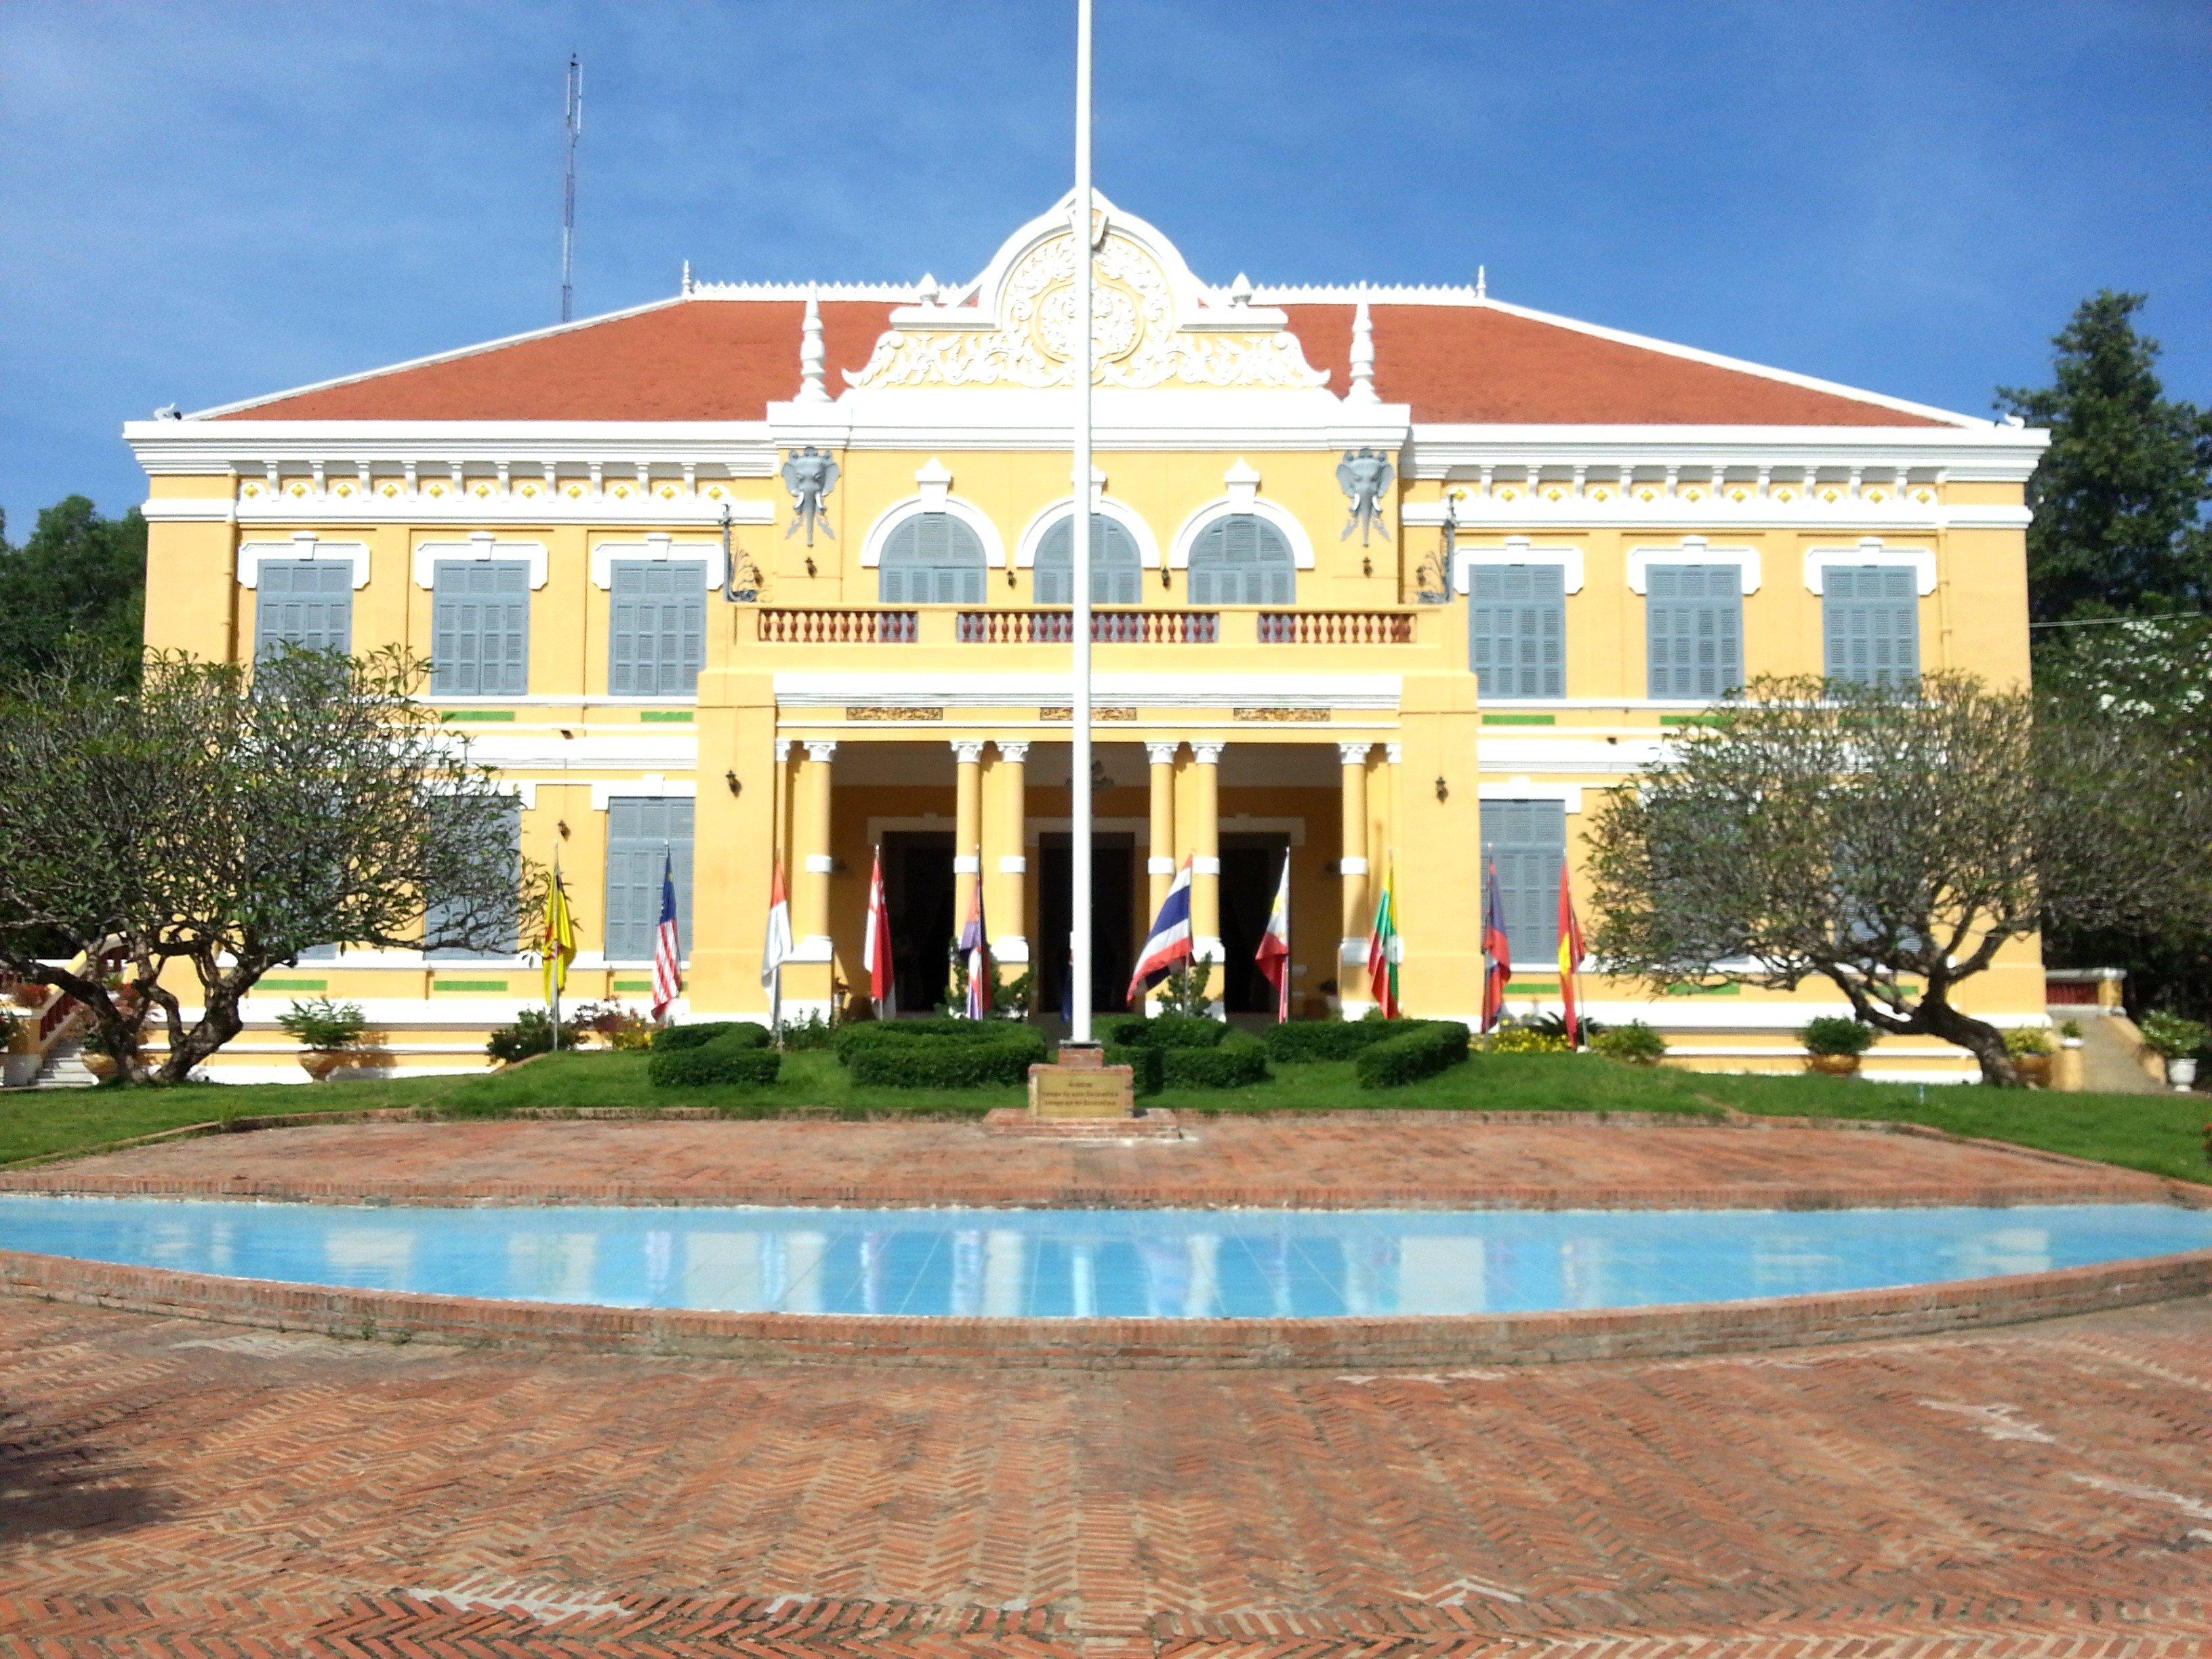 Governor's Residence in Battambang